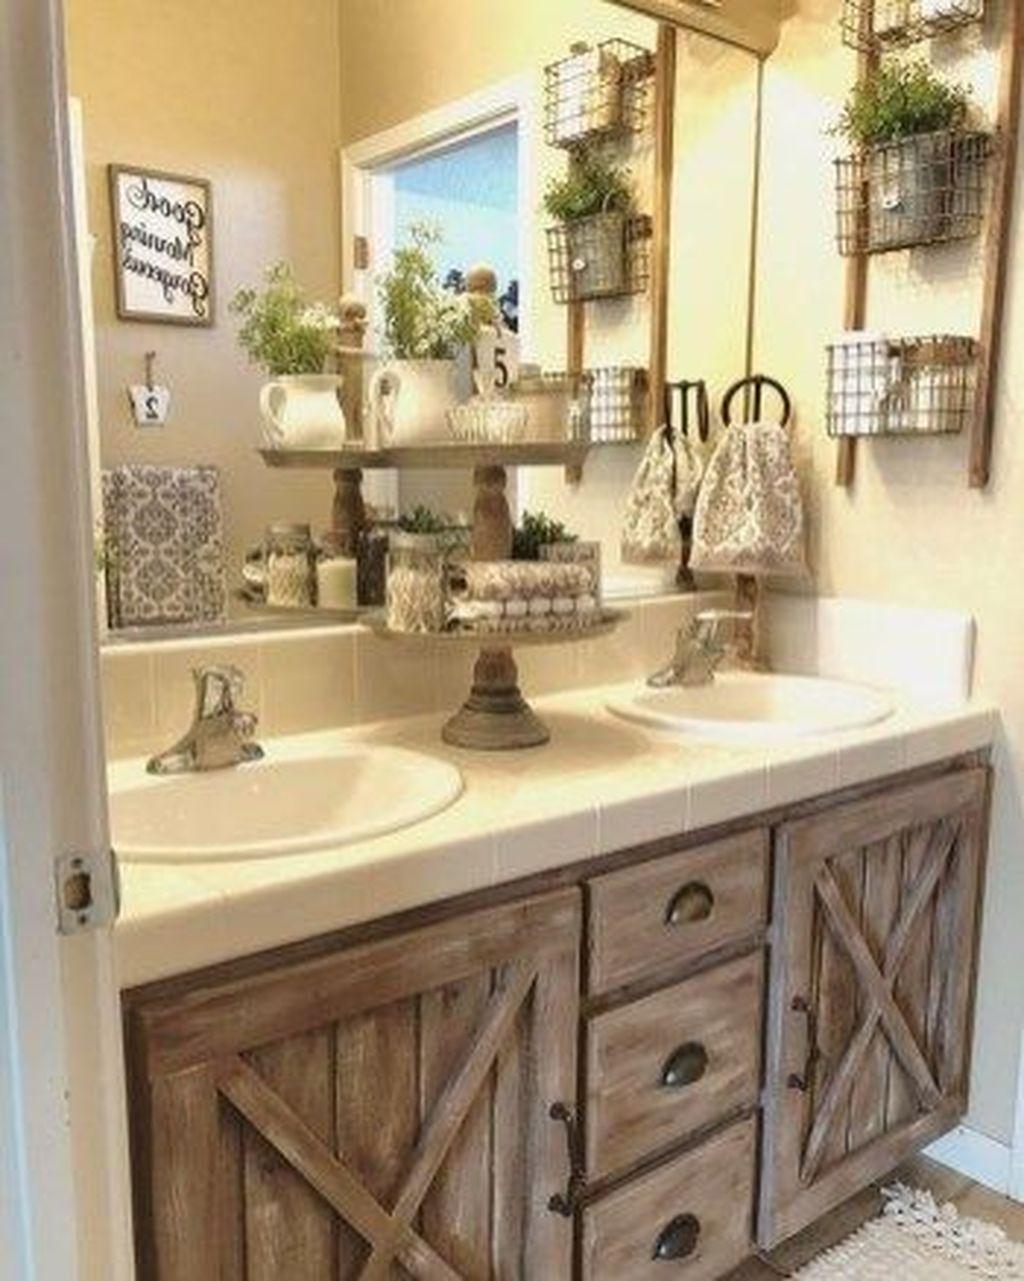 44 Affordable Farmhouse Bathroom Design Ideas - HOMYHOMEE